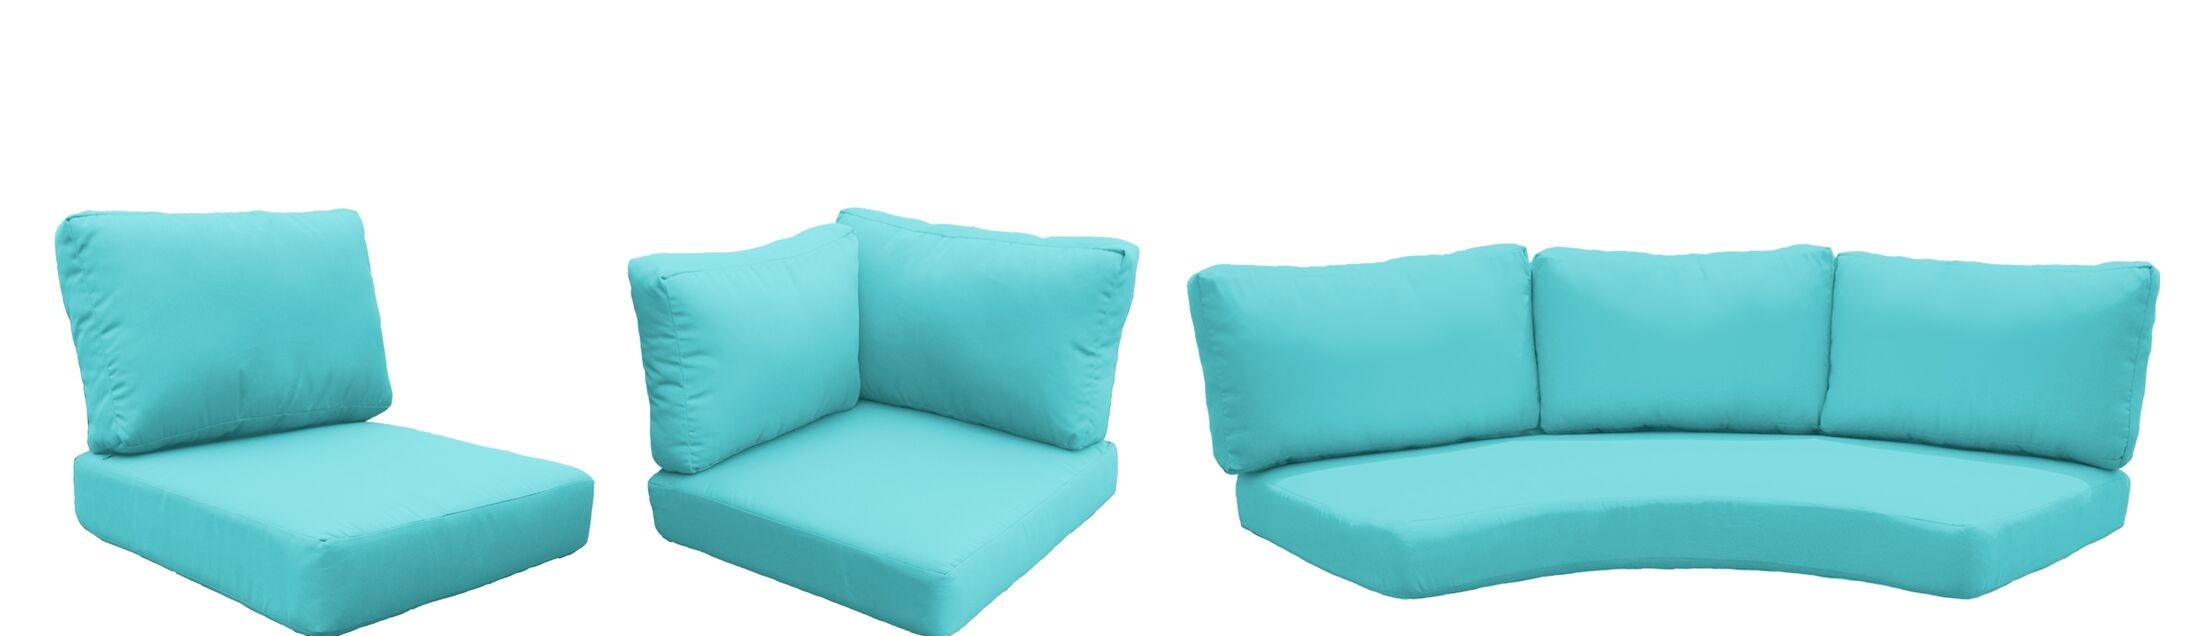 East Village 14 Piece Outdoor Cushion Set Fabric: Aruba